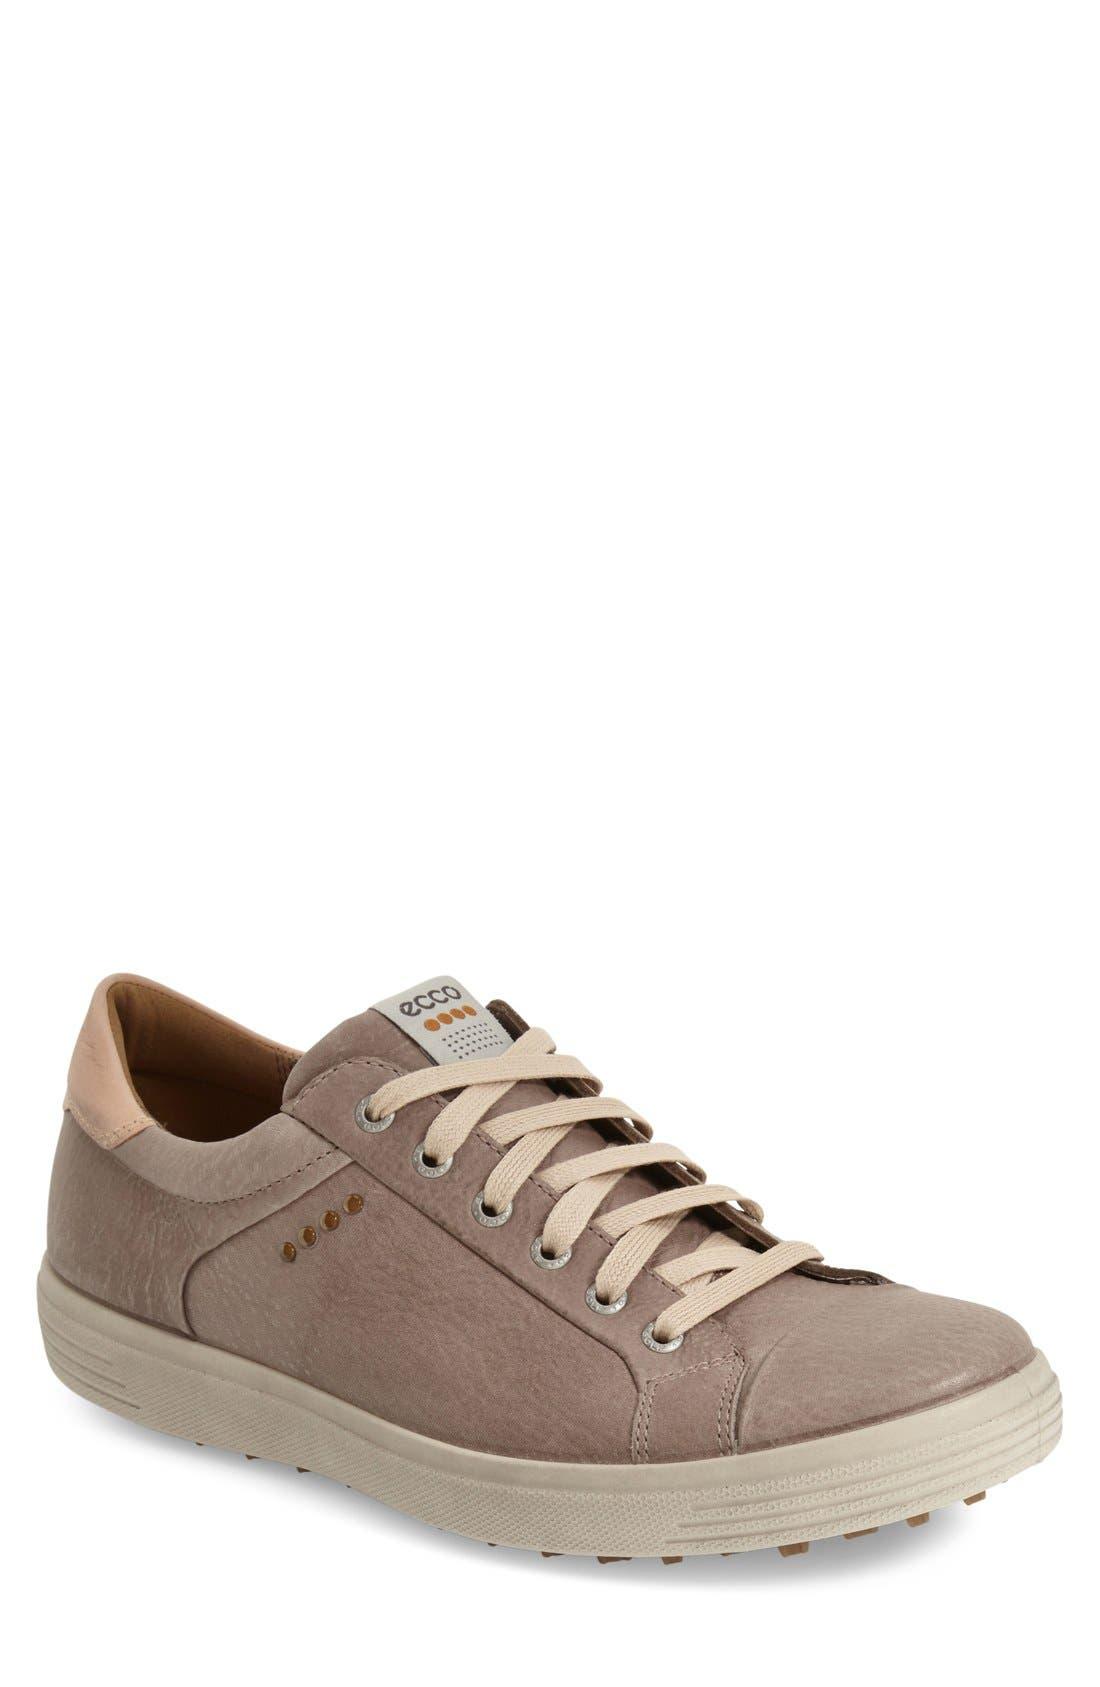 ECCO 'Casual Hybrid' Golf Shoe (Men)